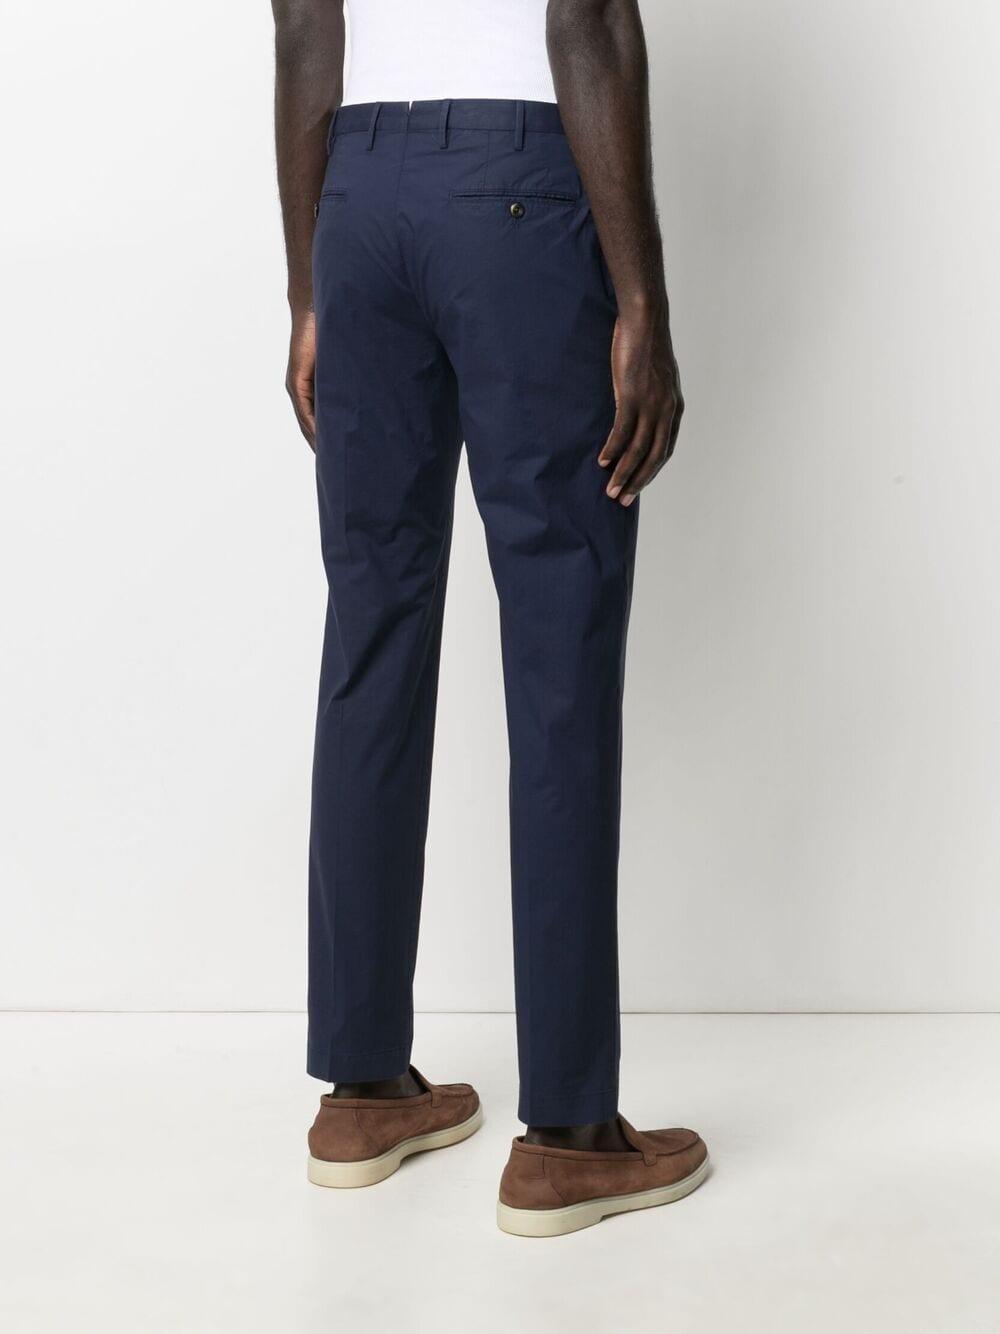 Pantaloni chino slim fit in cotone elasticizzato blu navy PT01   Pantaloni   COKLZEZ00CL1-BP230360